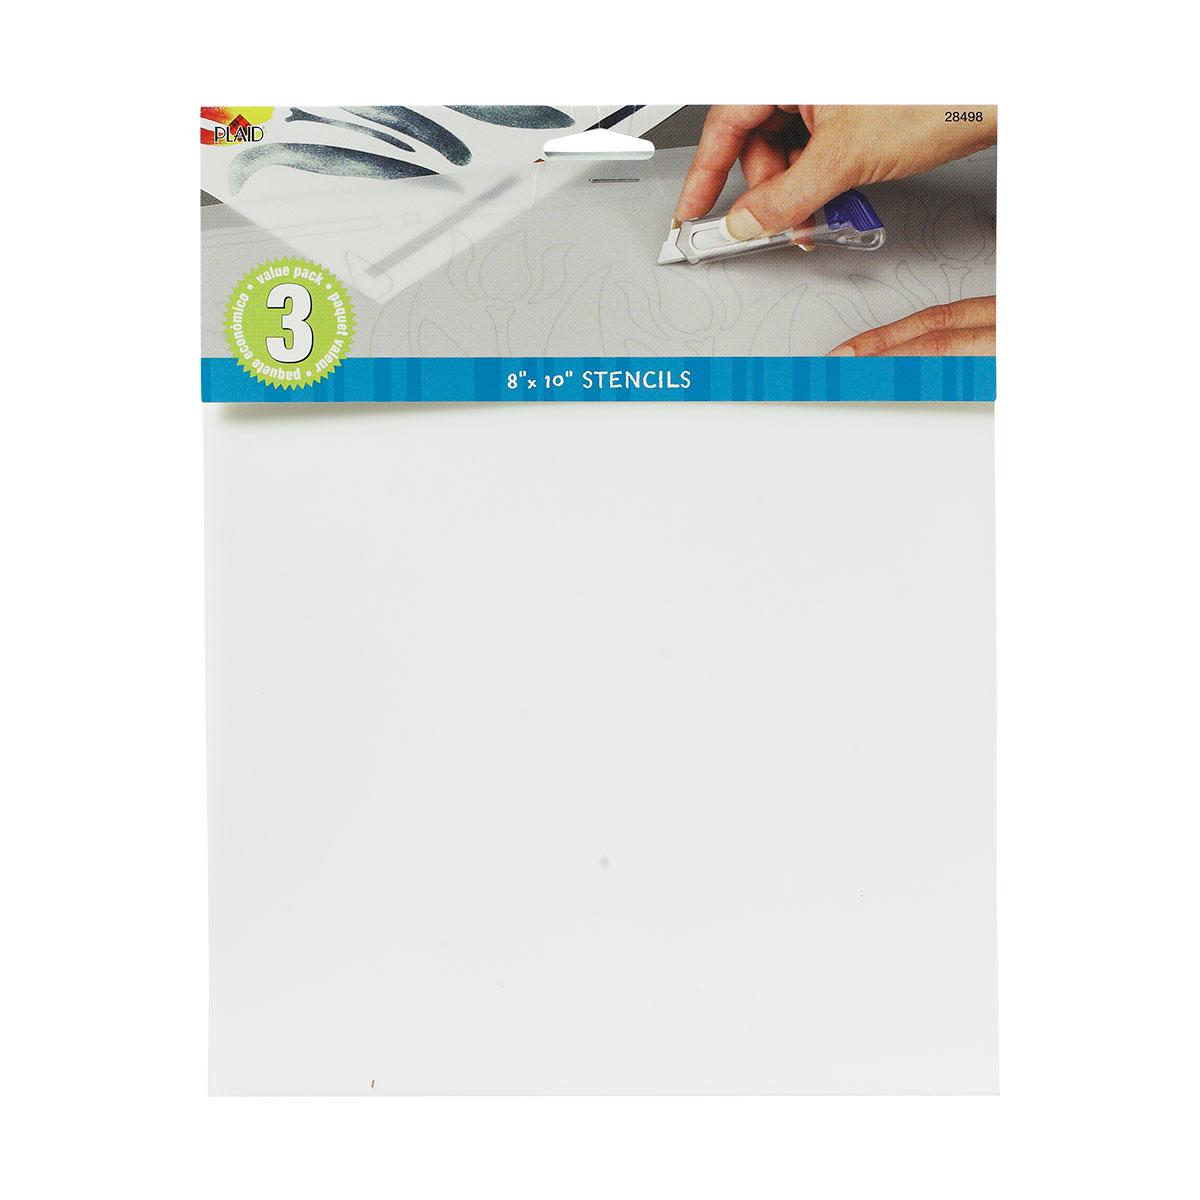 Simply ® Stencils - Value Packs - Blanks